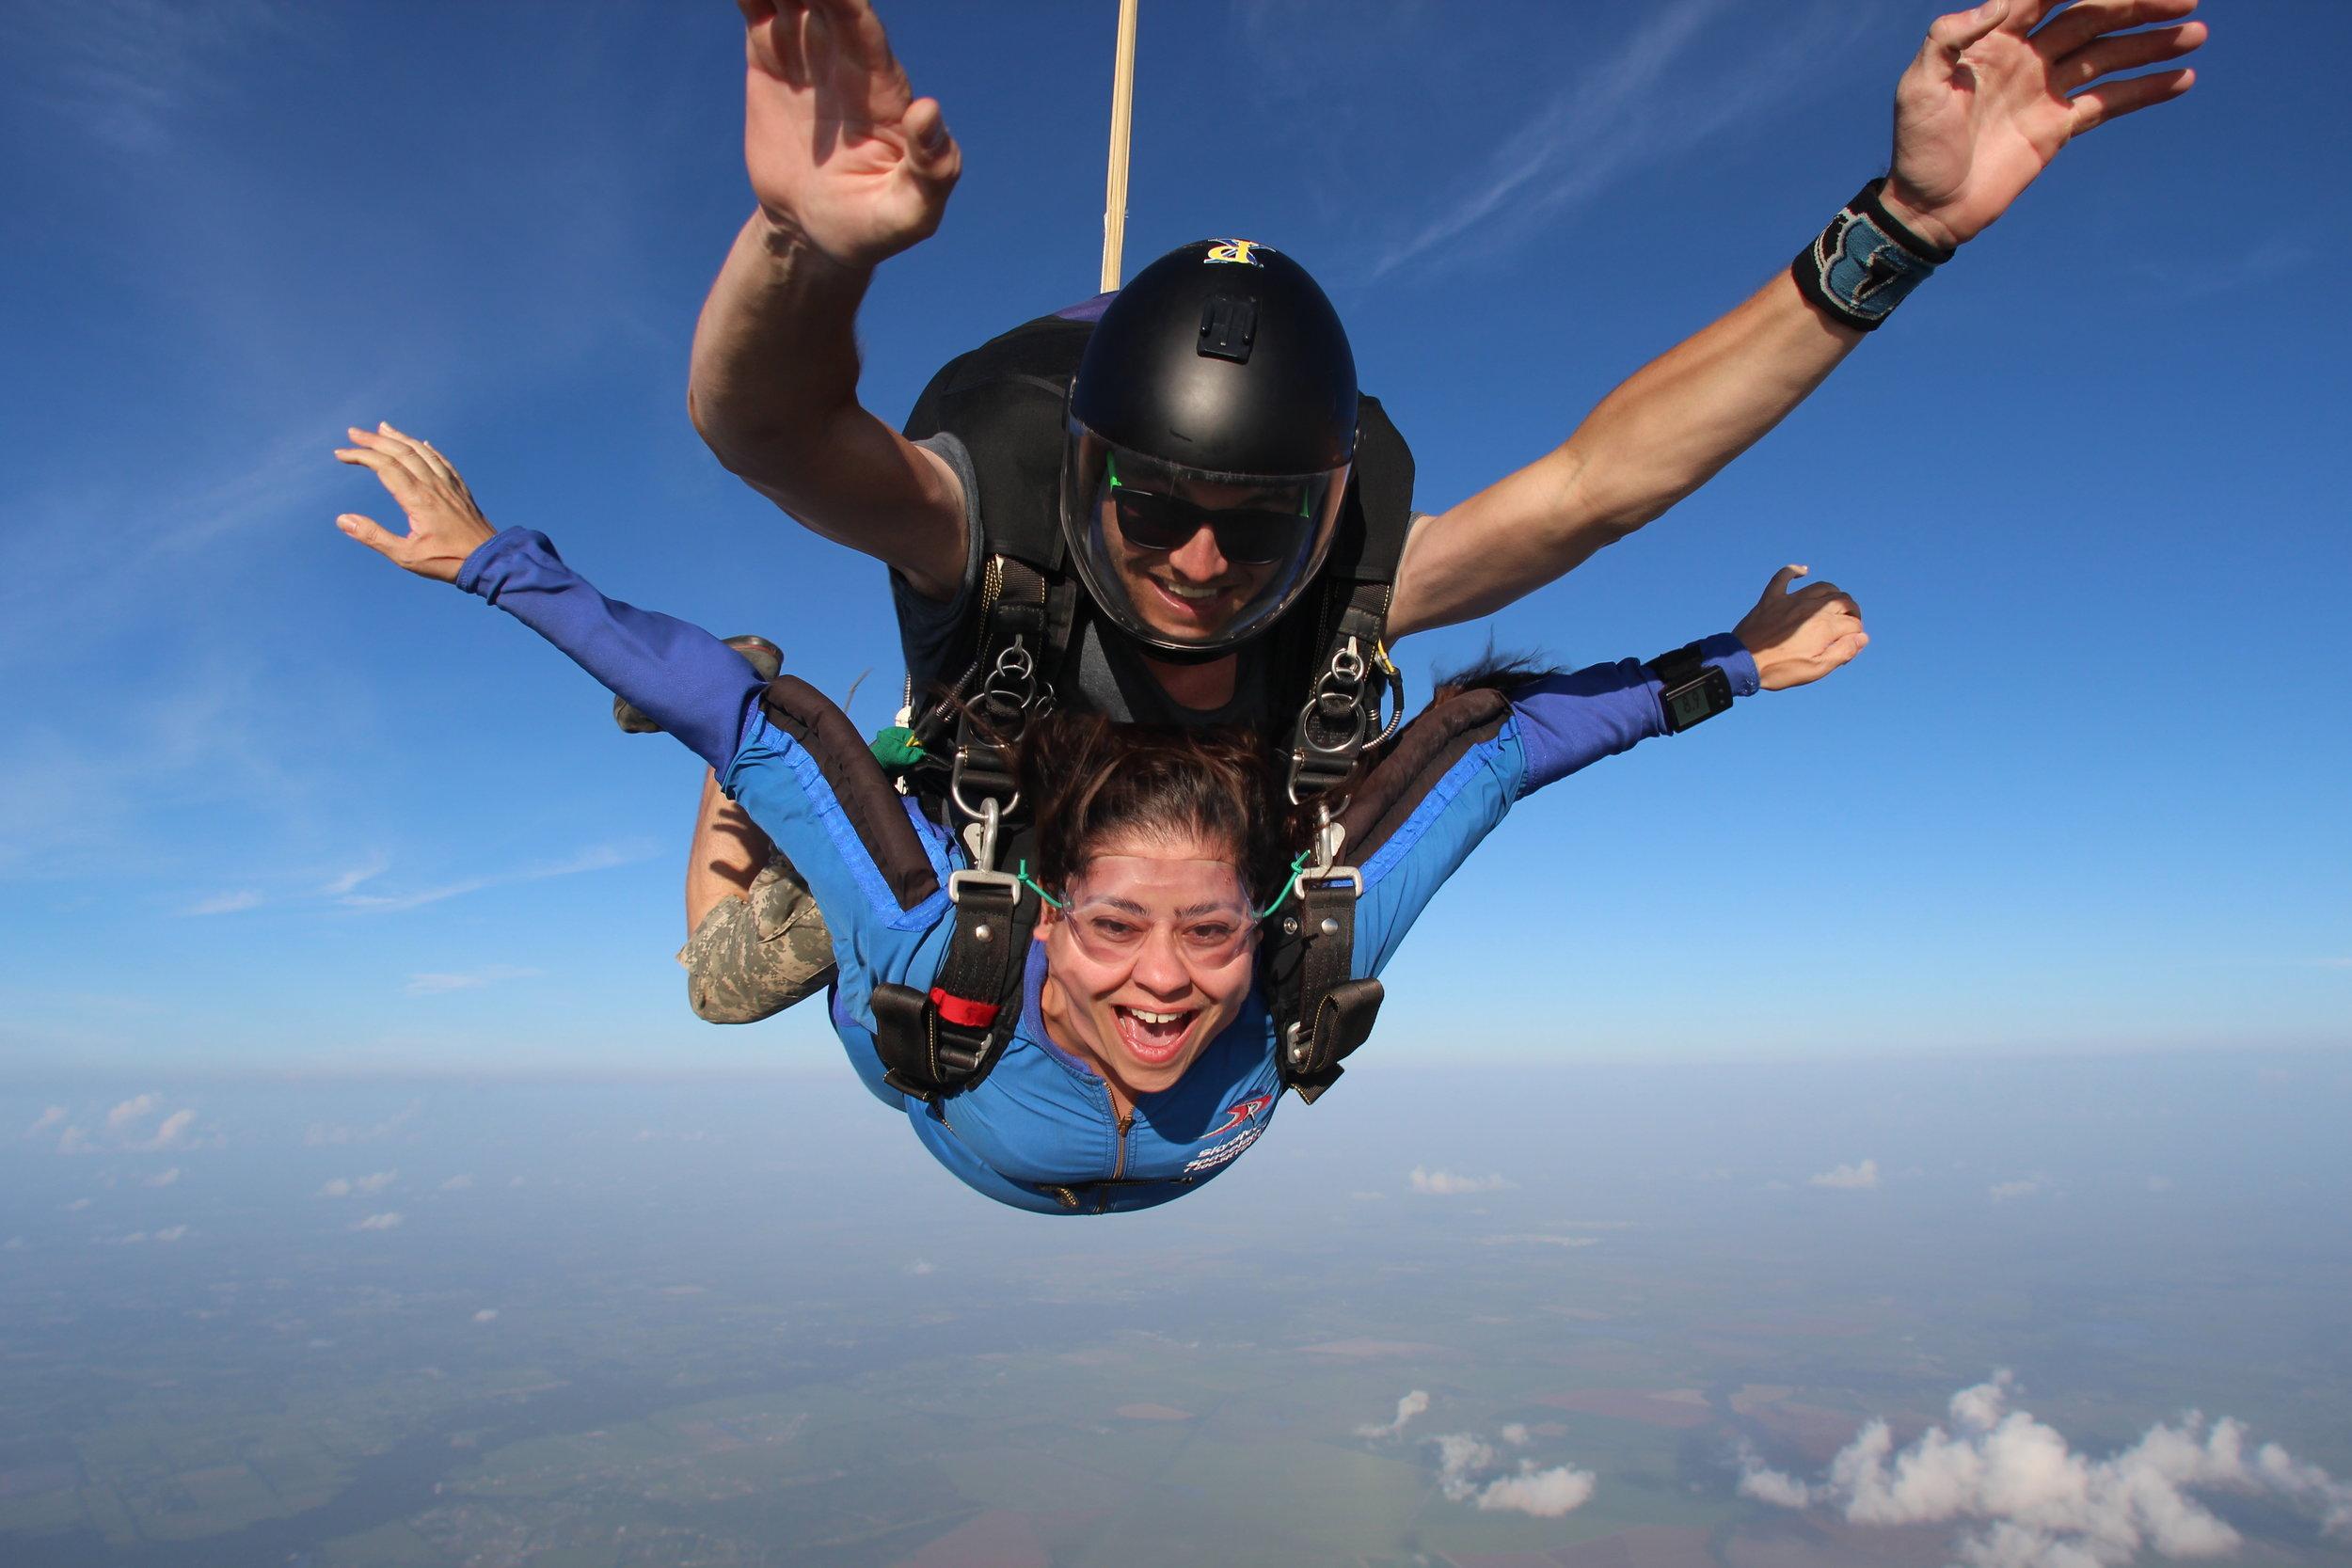 courage-sofia-skydive.JPG